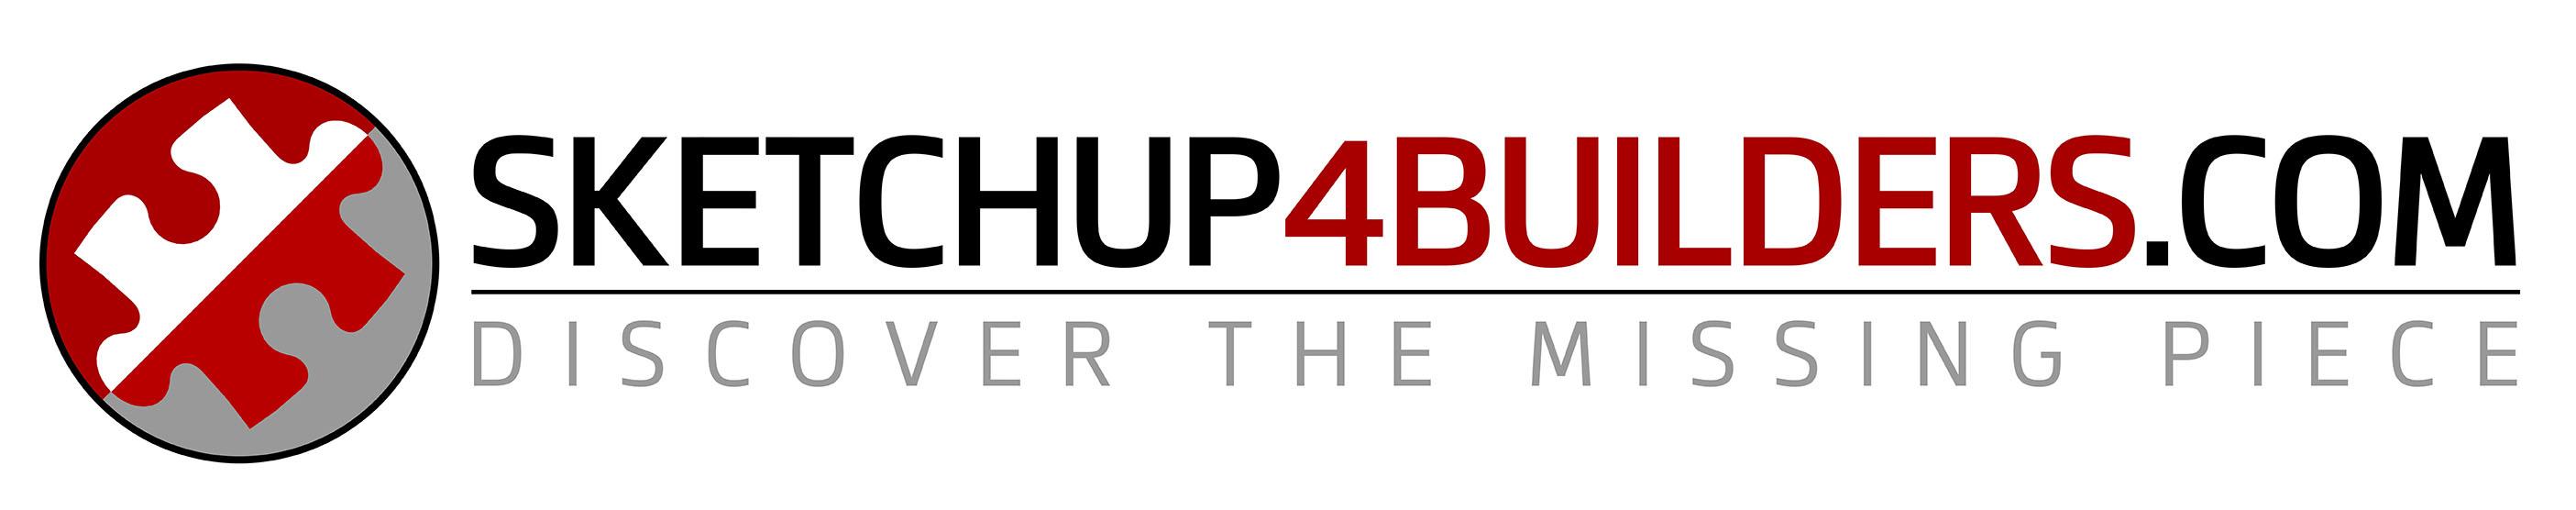 SketchUp4Builders.com